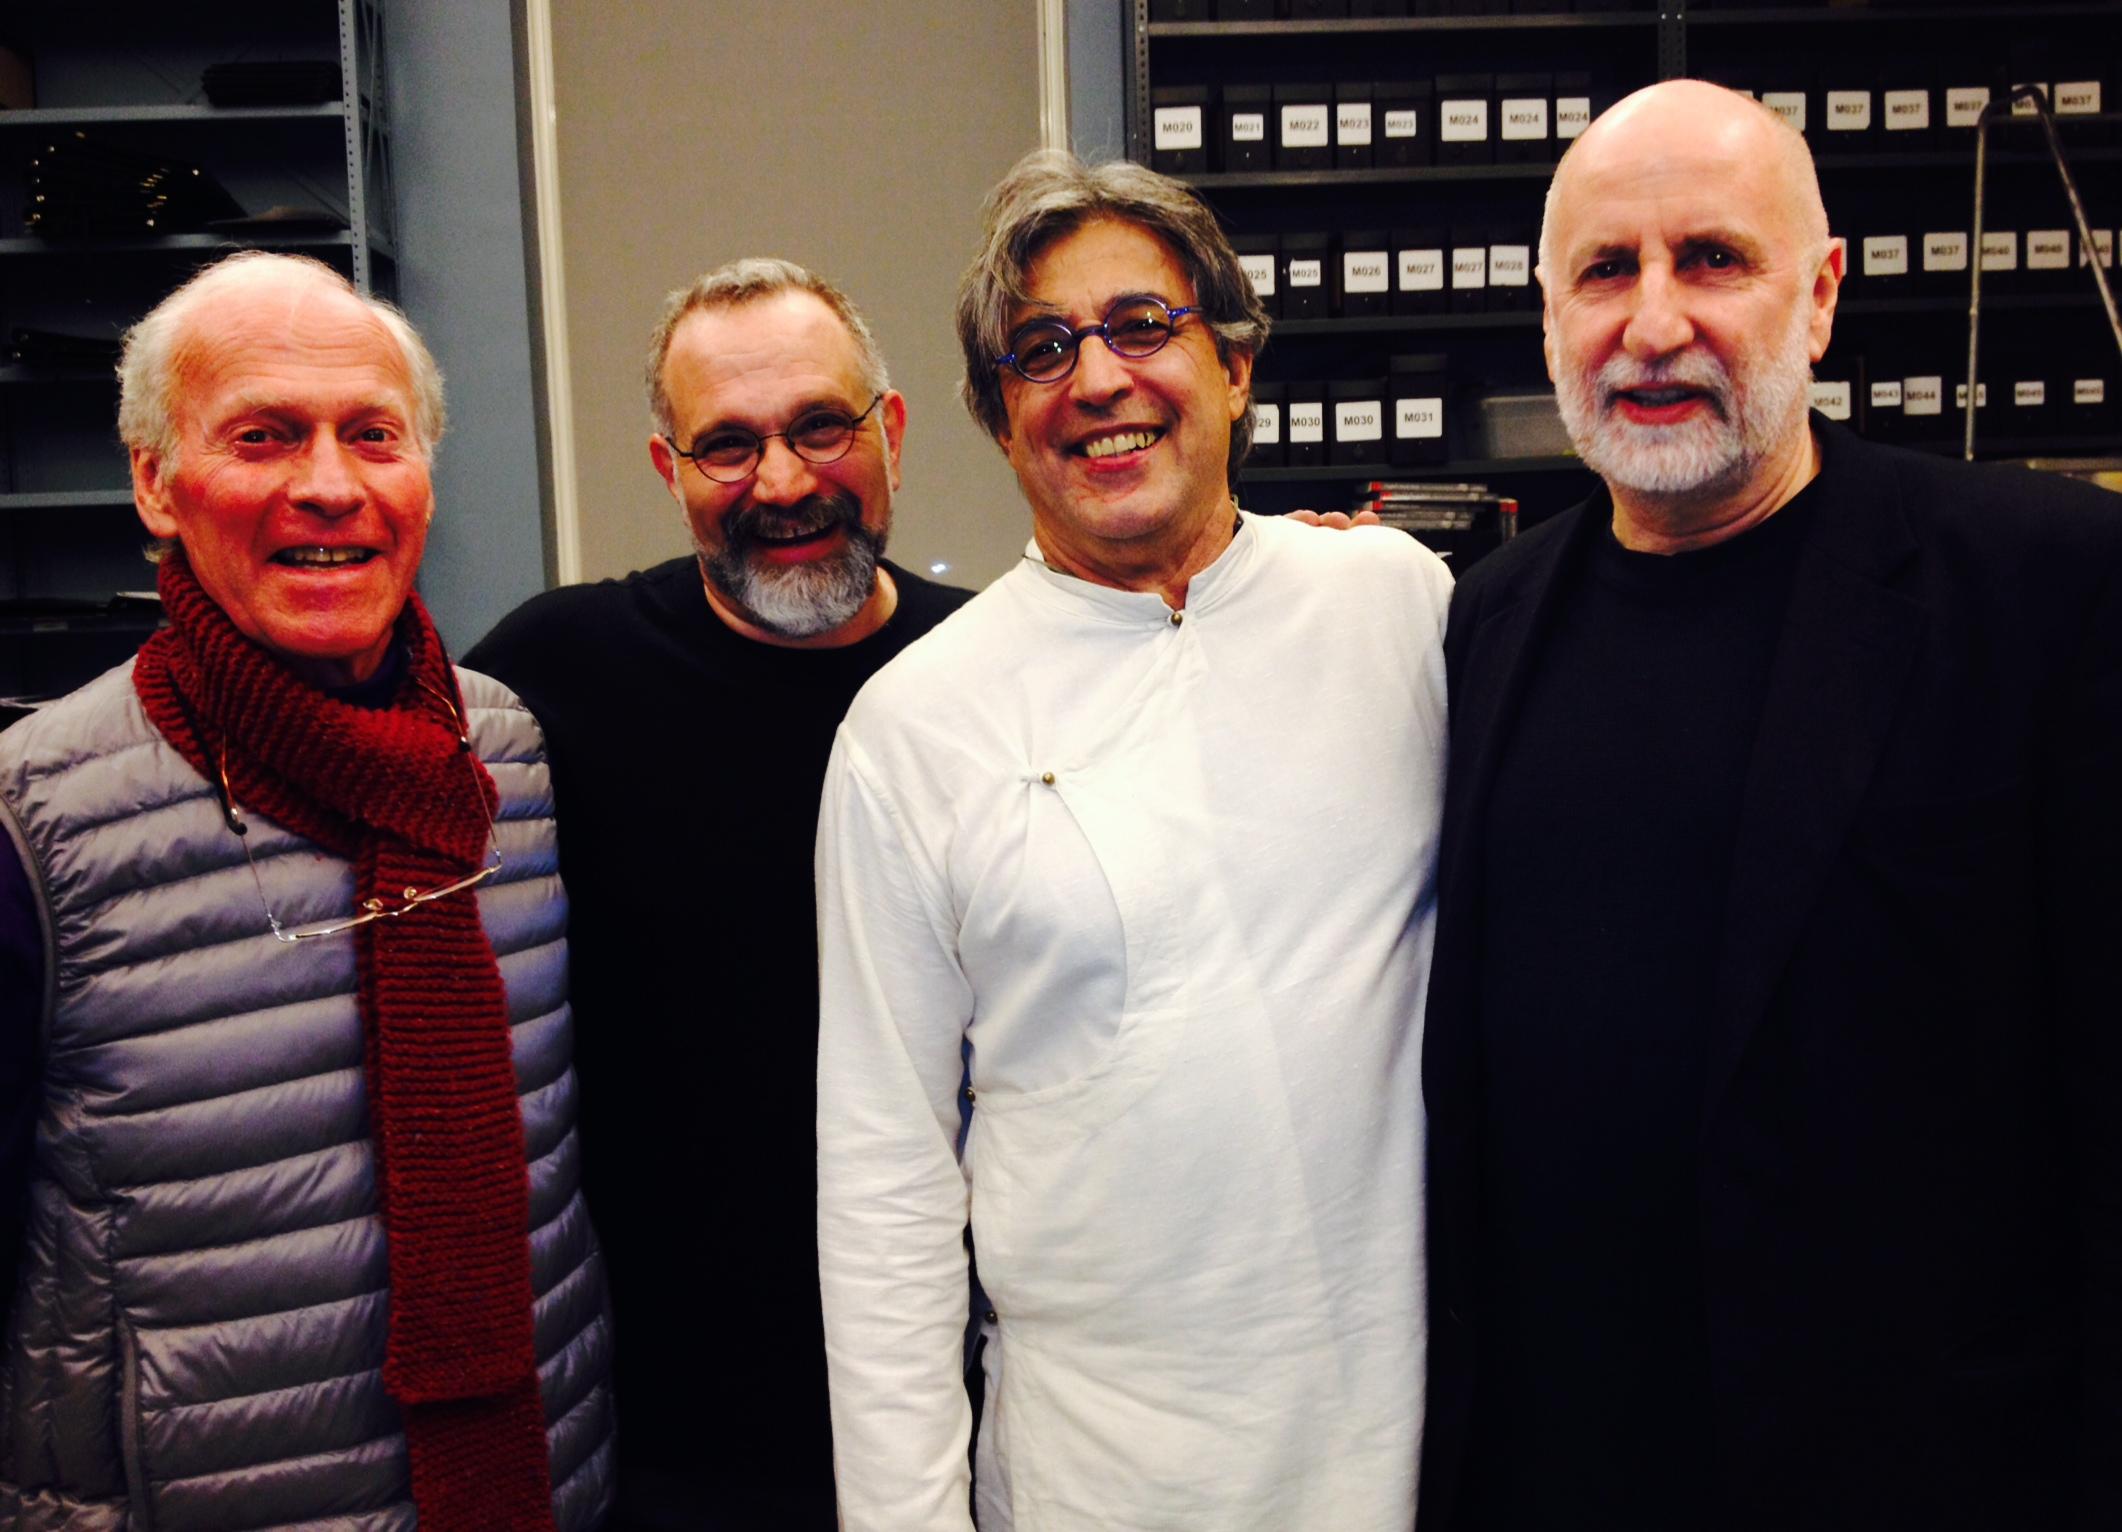 L to R: Paul McCandless, Eliot Wadopian, Ivan Lins, Eugene Friesen